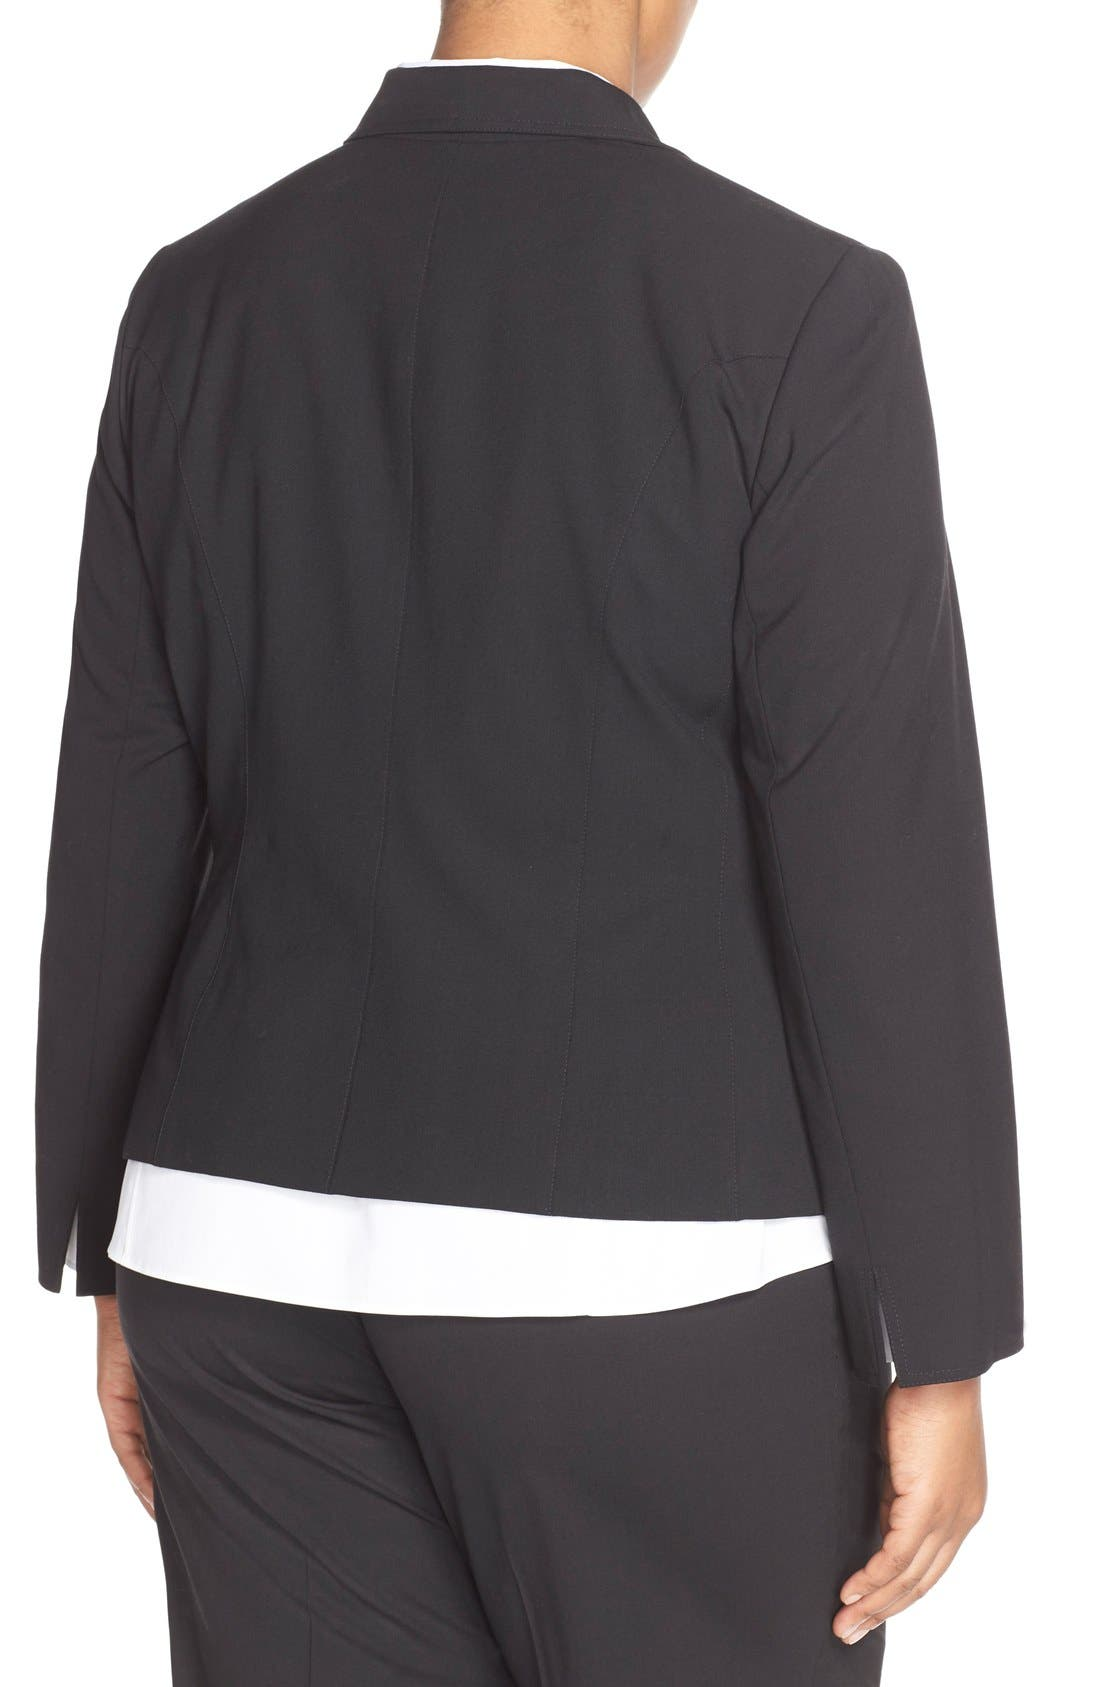 Alternate Image 2  - Lafayette 148 New York 'Gladstone' Stretch Wool Jacket (Plus Size) (Nordstrom Exclusive)